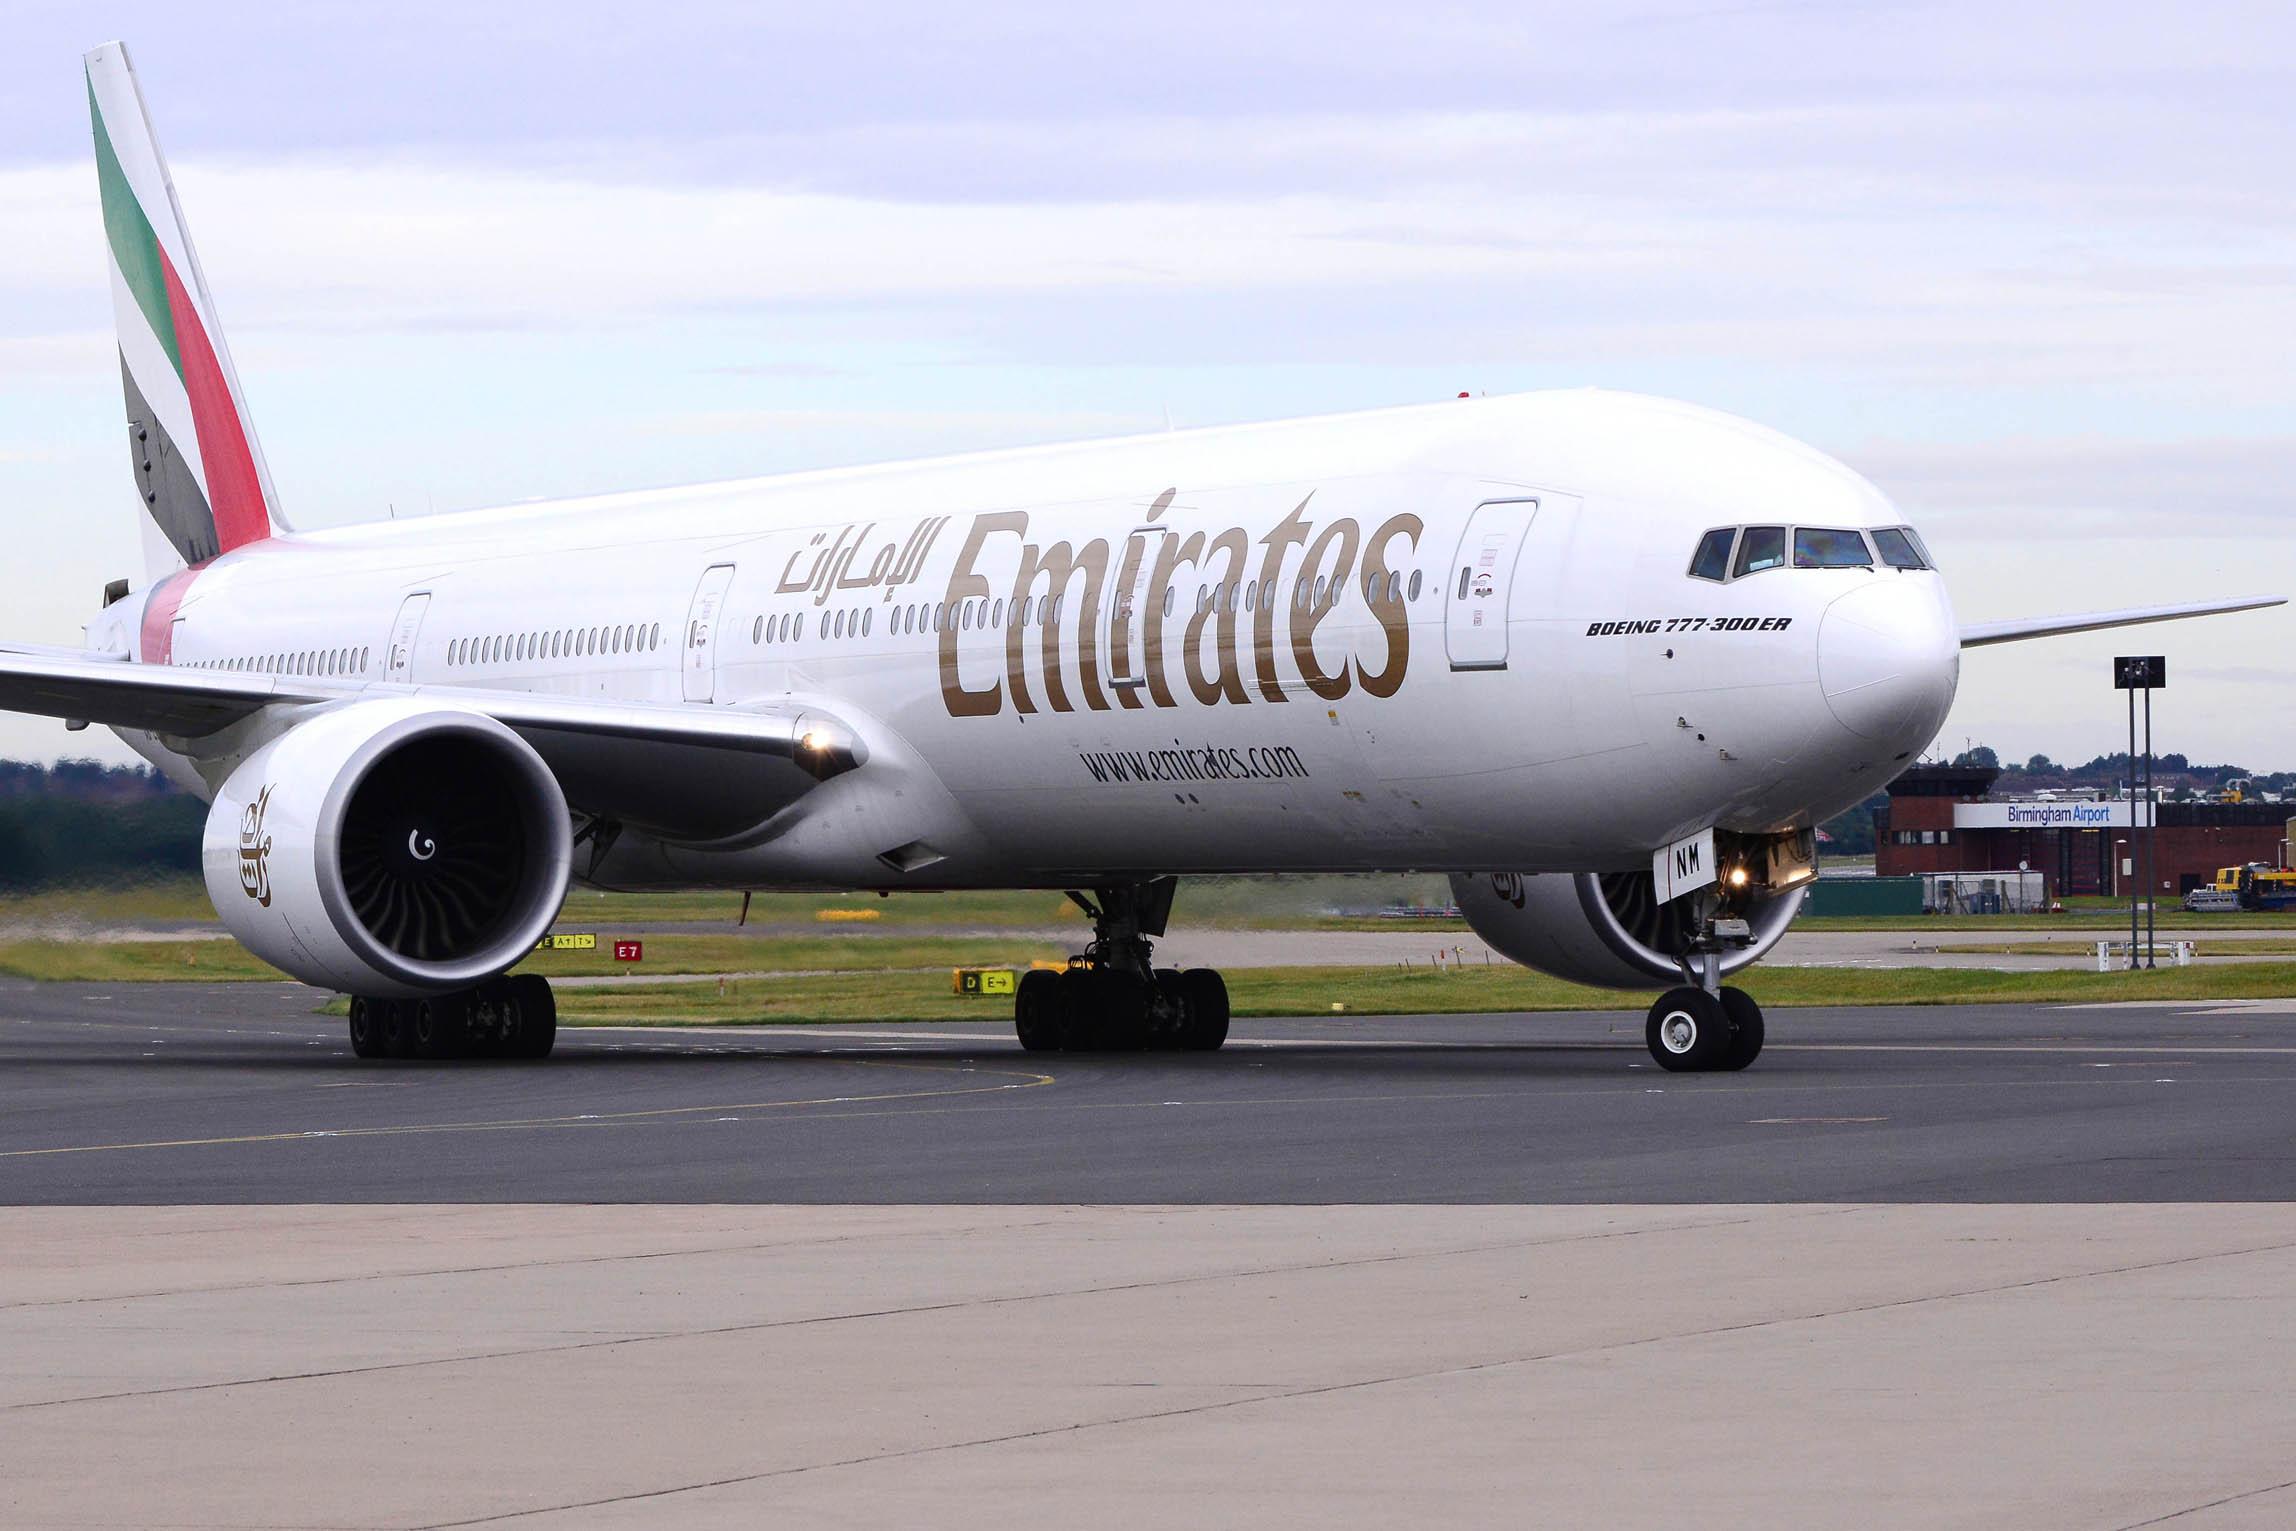 Emirates has returned to its Midlands gateway